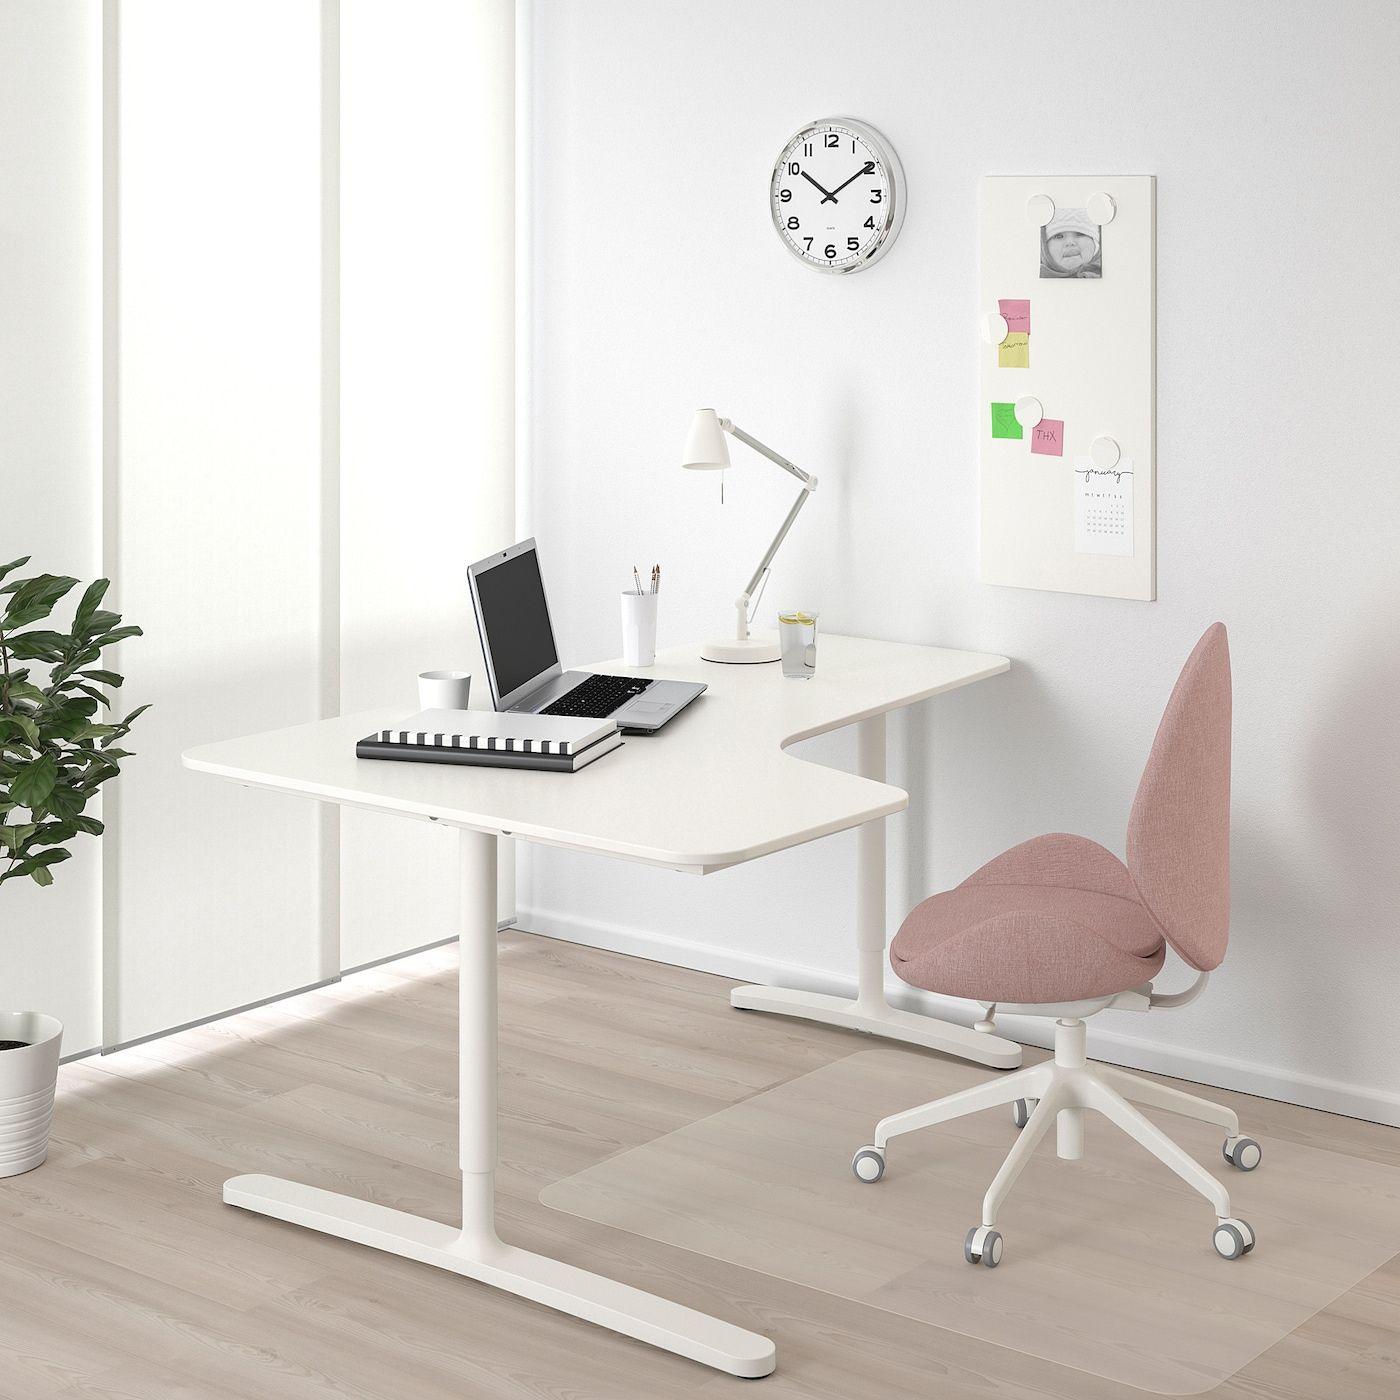 Bekant Corner Desk Left White Ikea In 2020 Ikea Bekant Corner Desk Diy Corner Desk